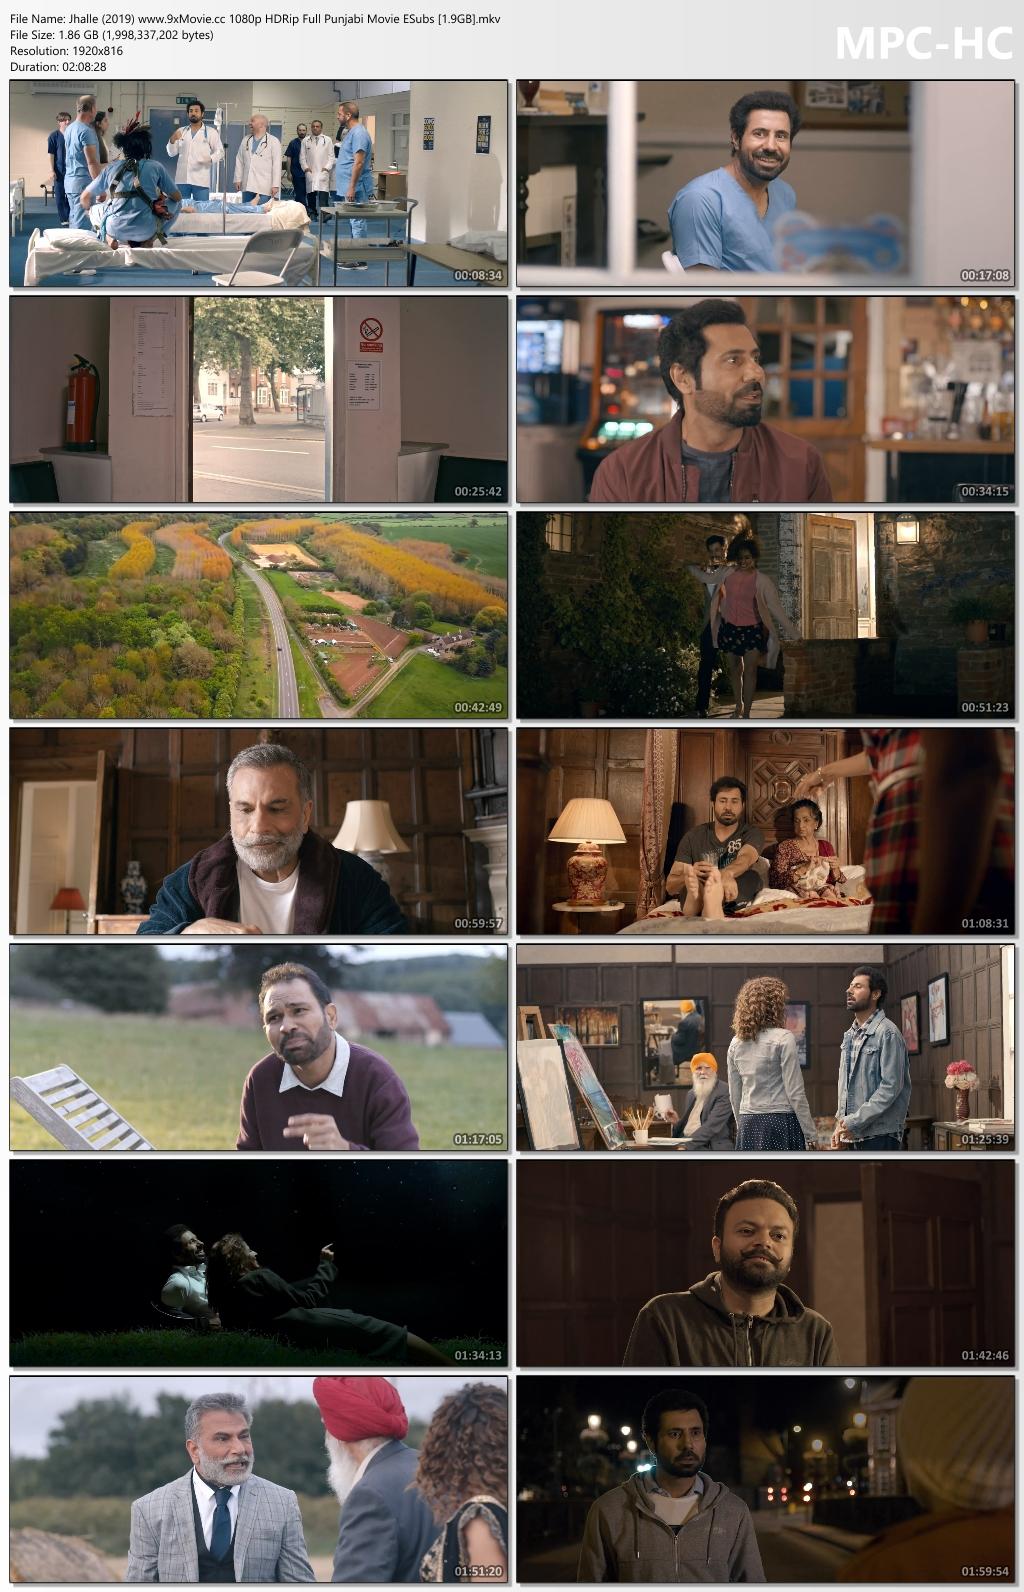 Jhalle-2019-www-9x-Movie-cc-1080p-HDRip-Full-Punjabi-Movie-ESubs-1-9-GB-mkv